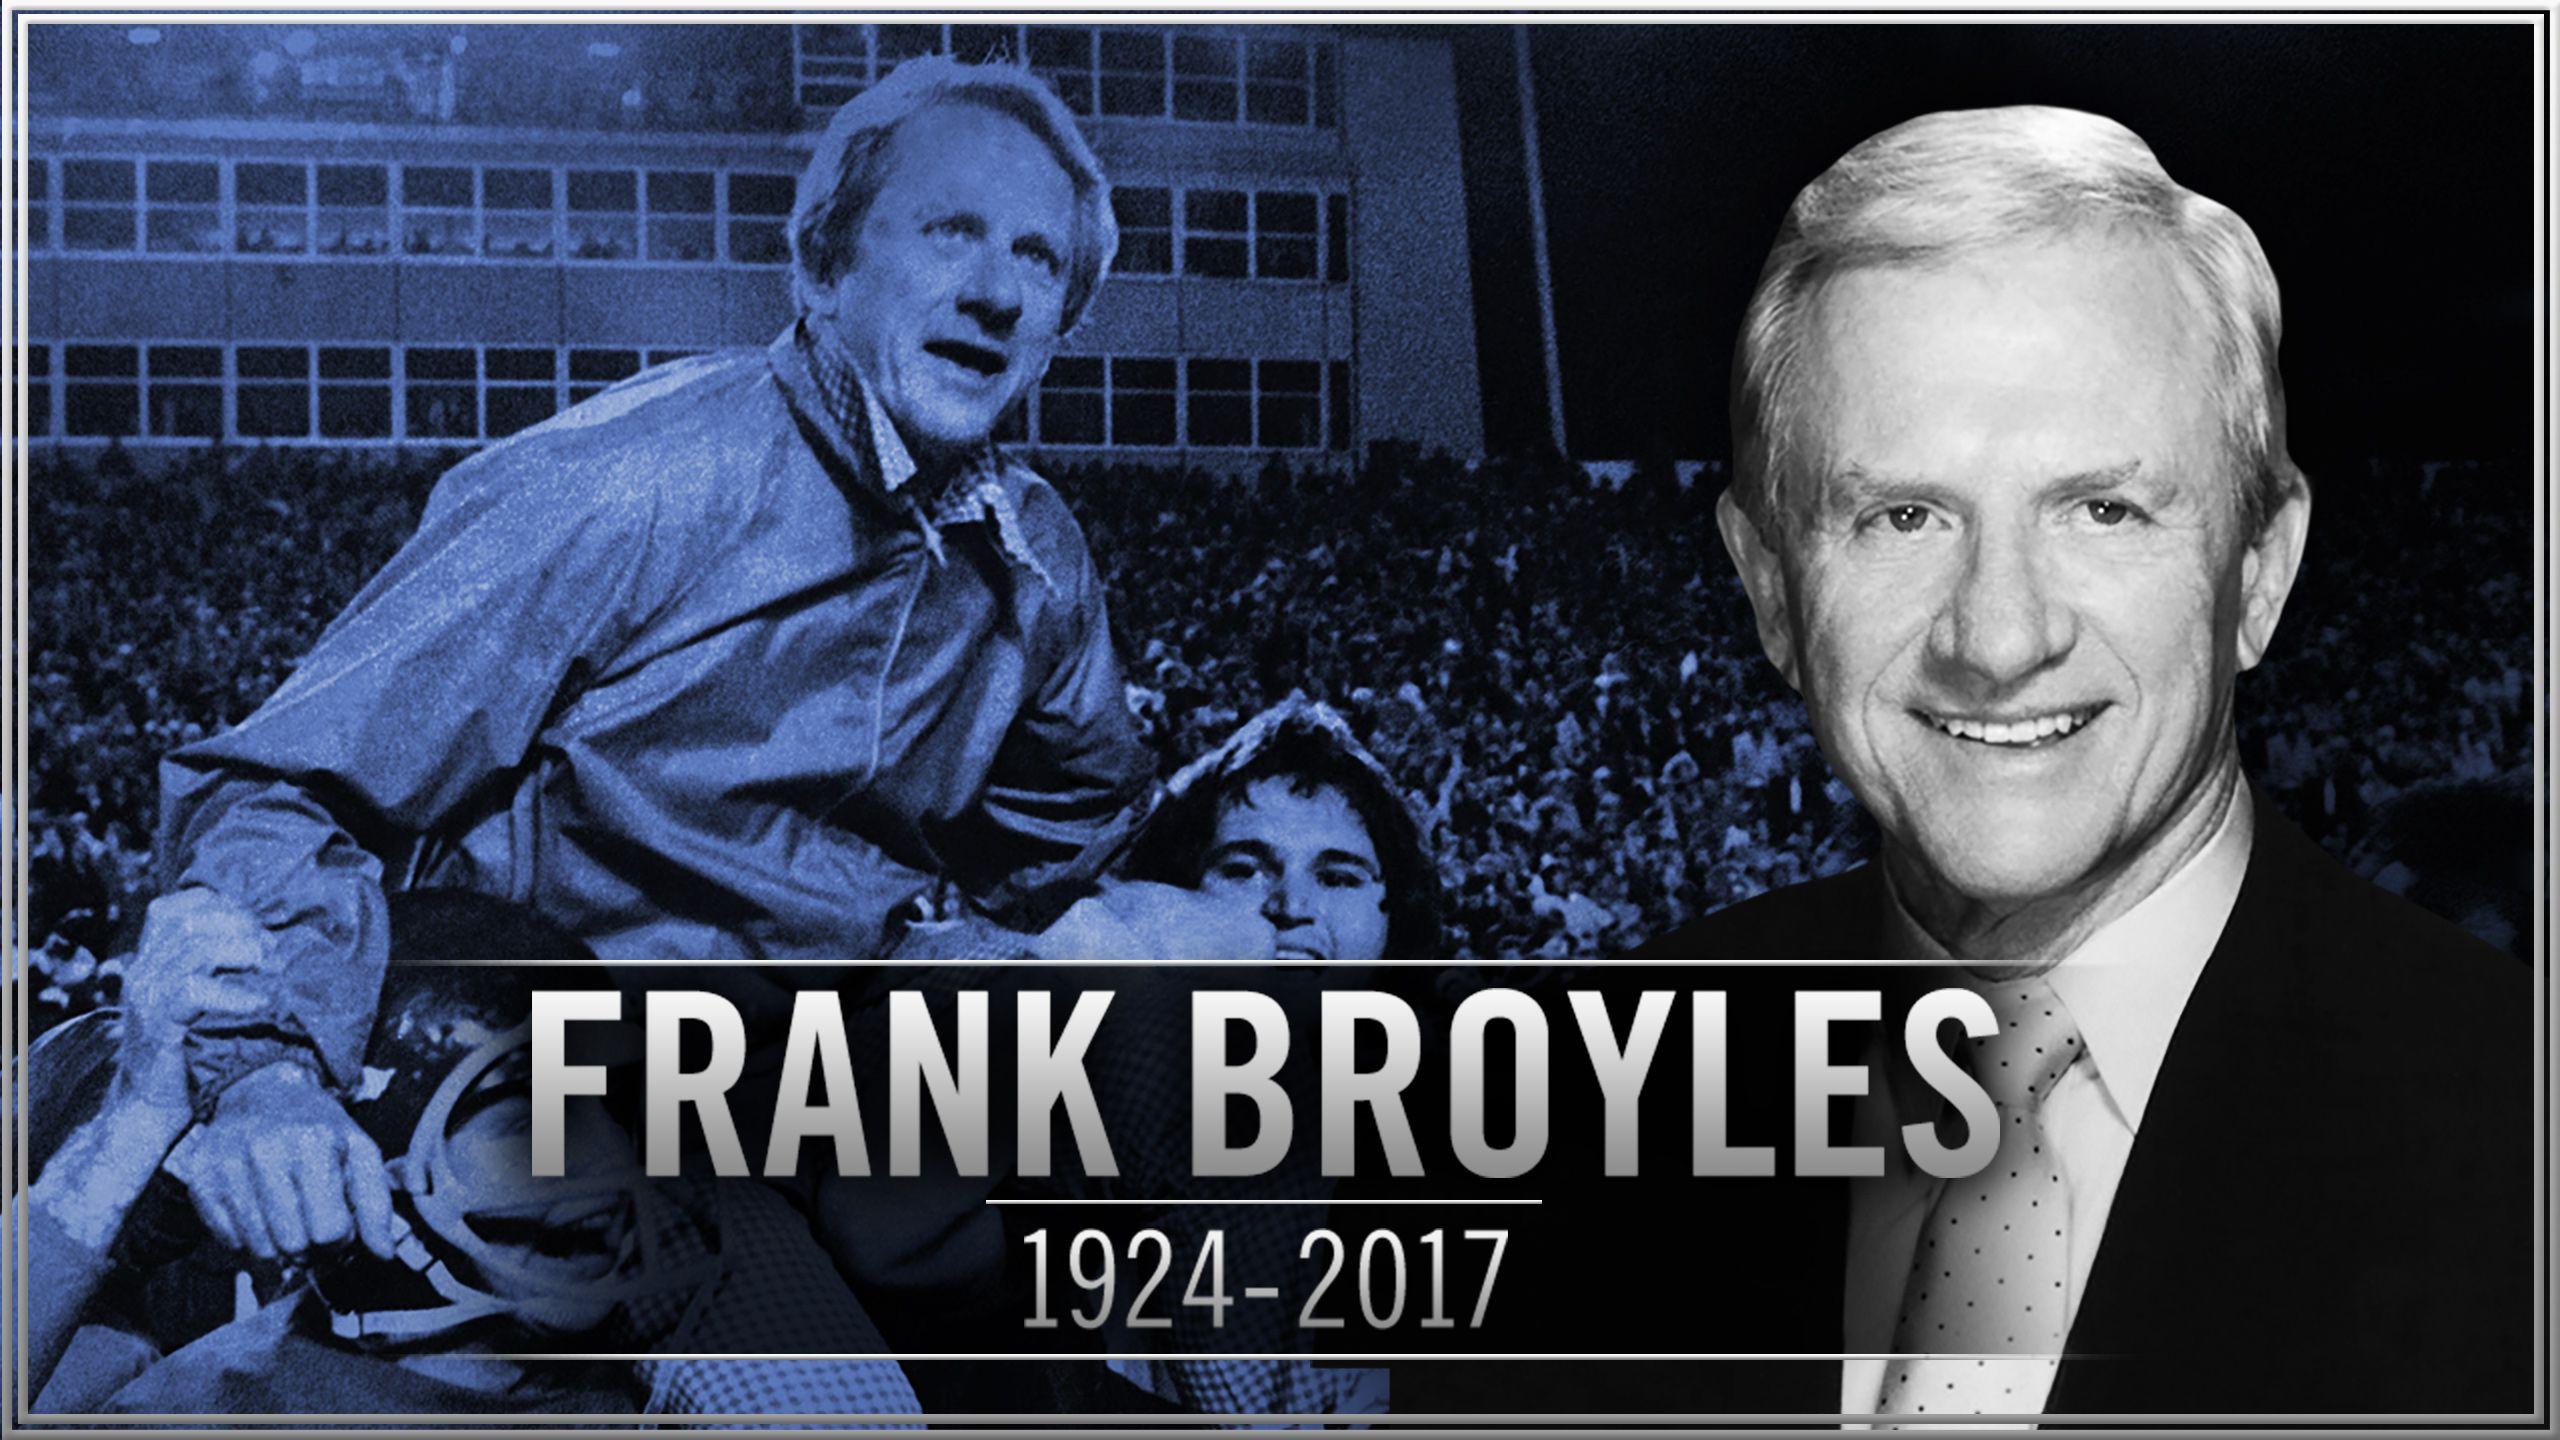 Frank Broyles Celebration of Life